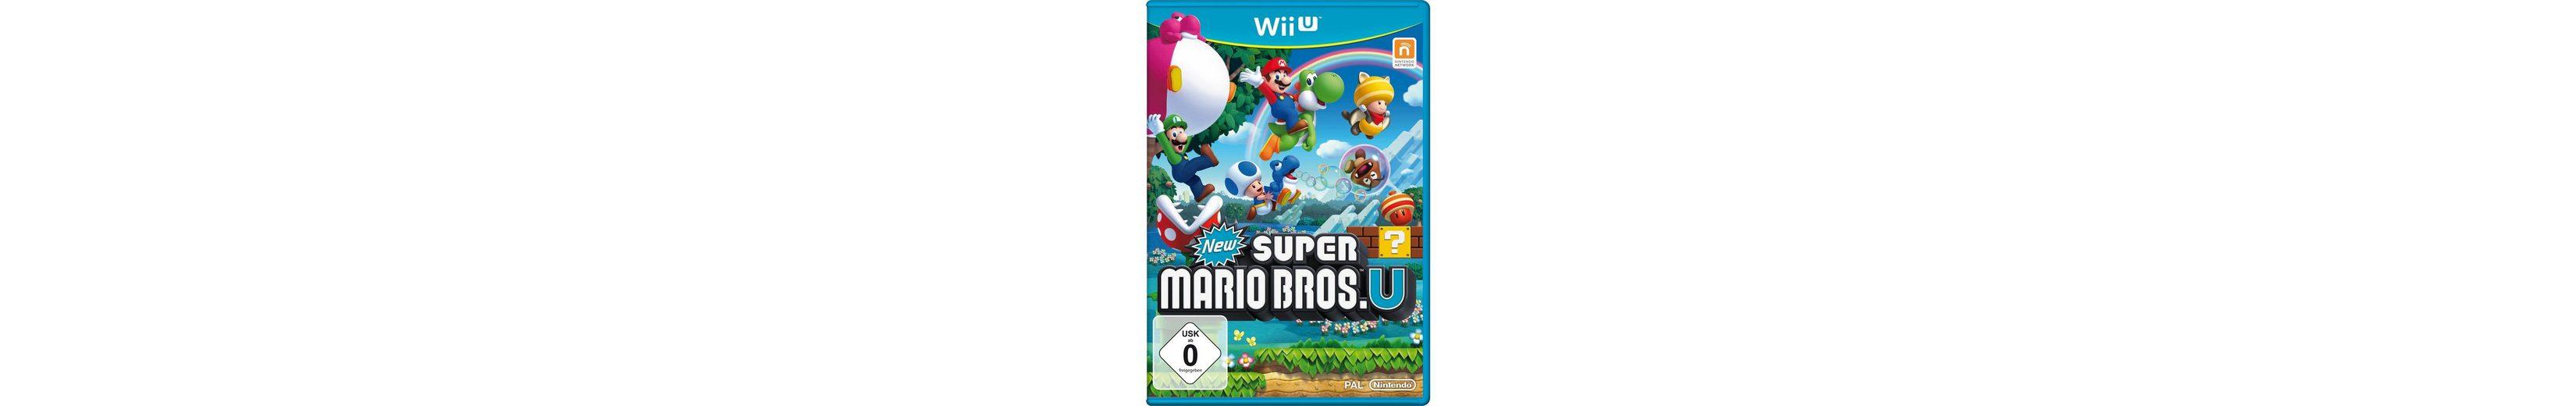 Wii-U-Spiel »New Super Mario Bros. U«